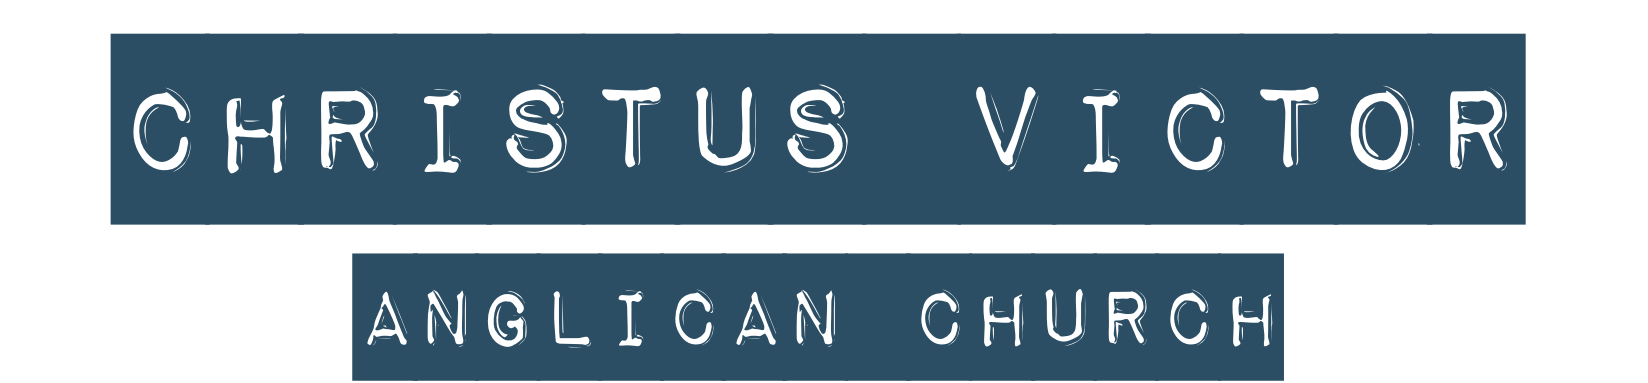 Christus Victor Anglican Church—Phoenix, AZ